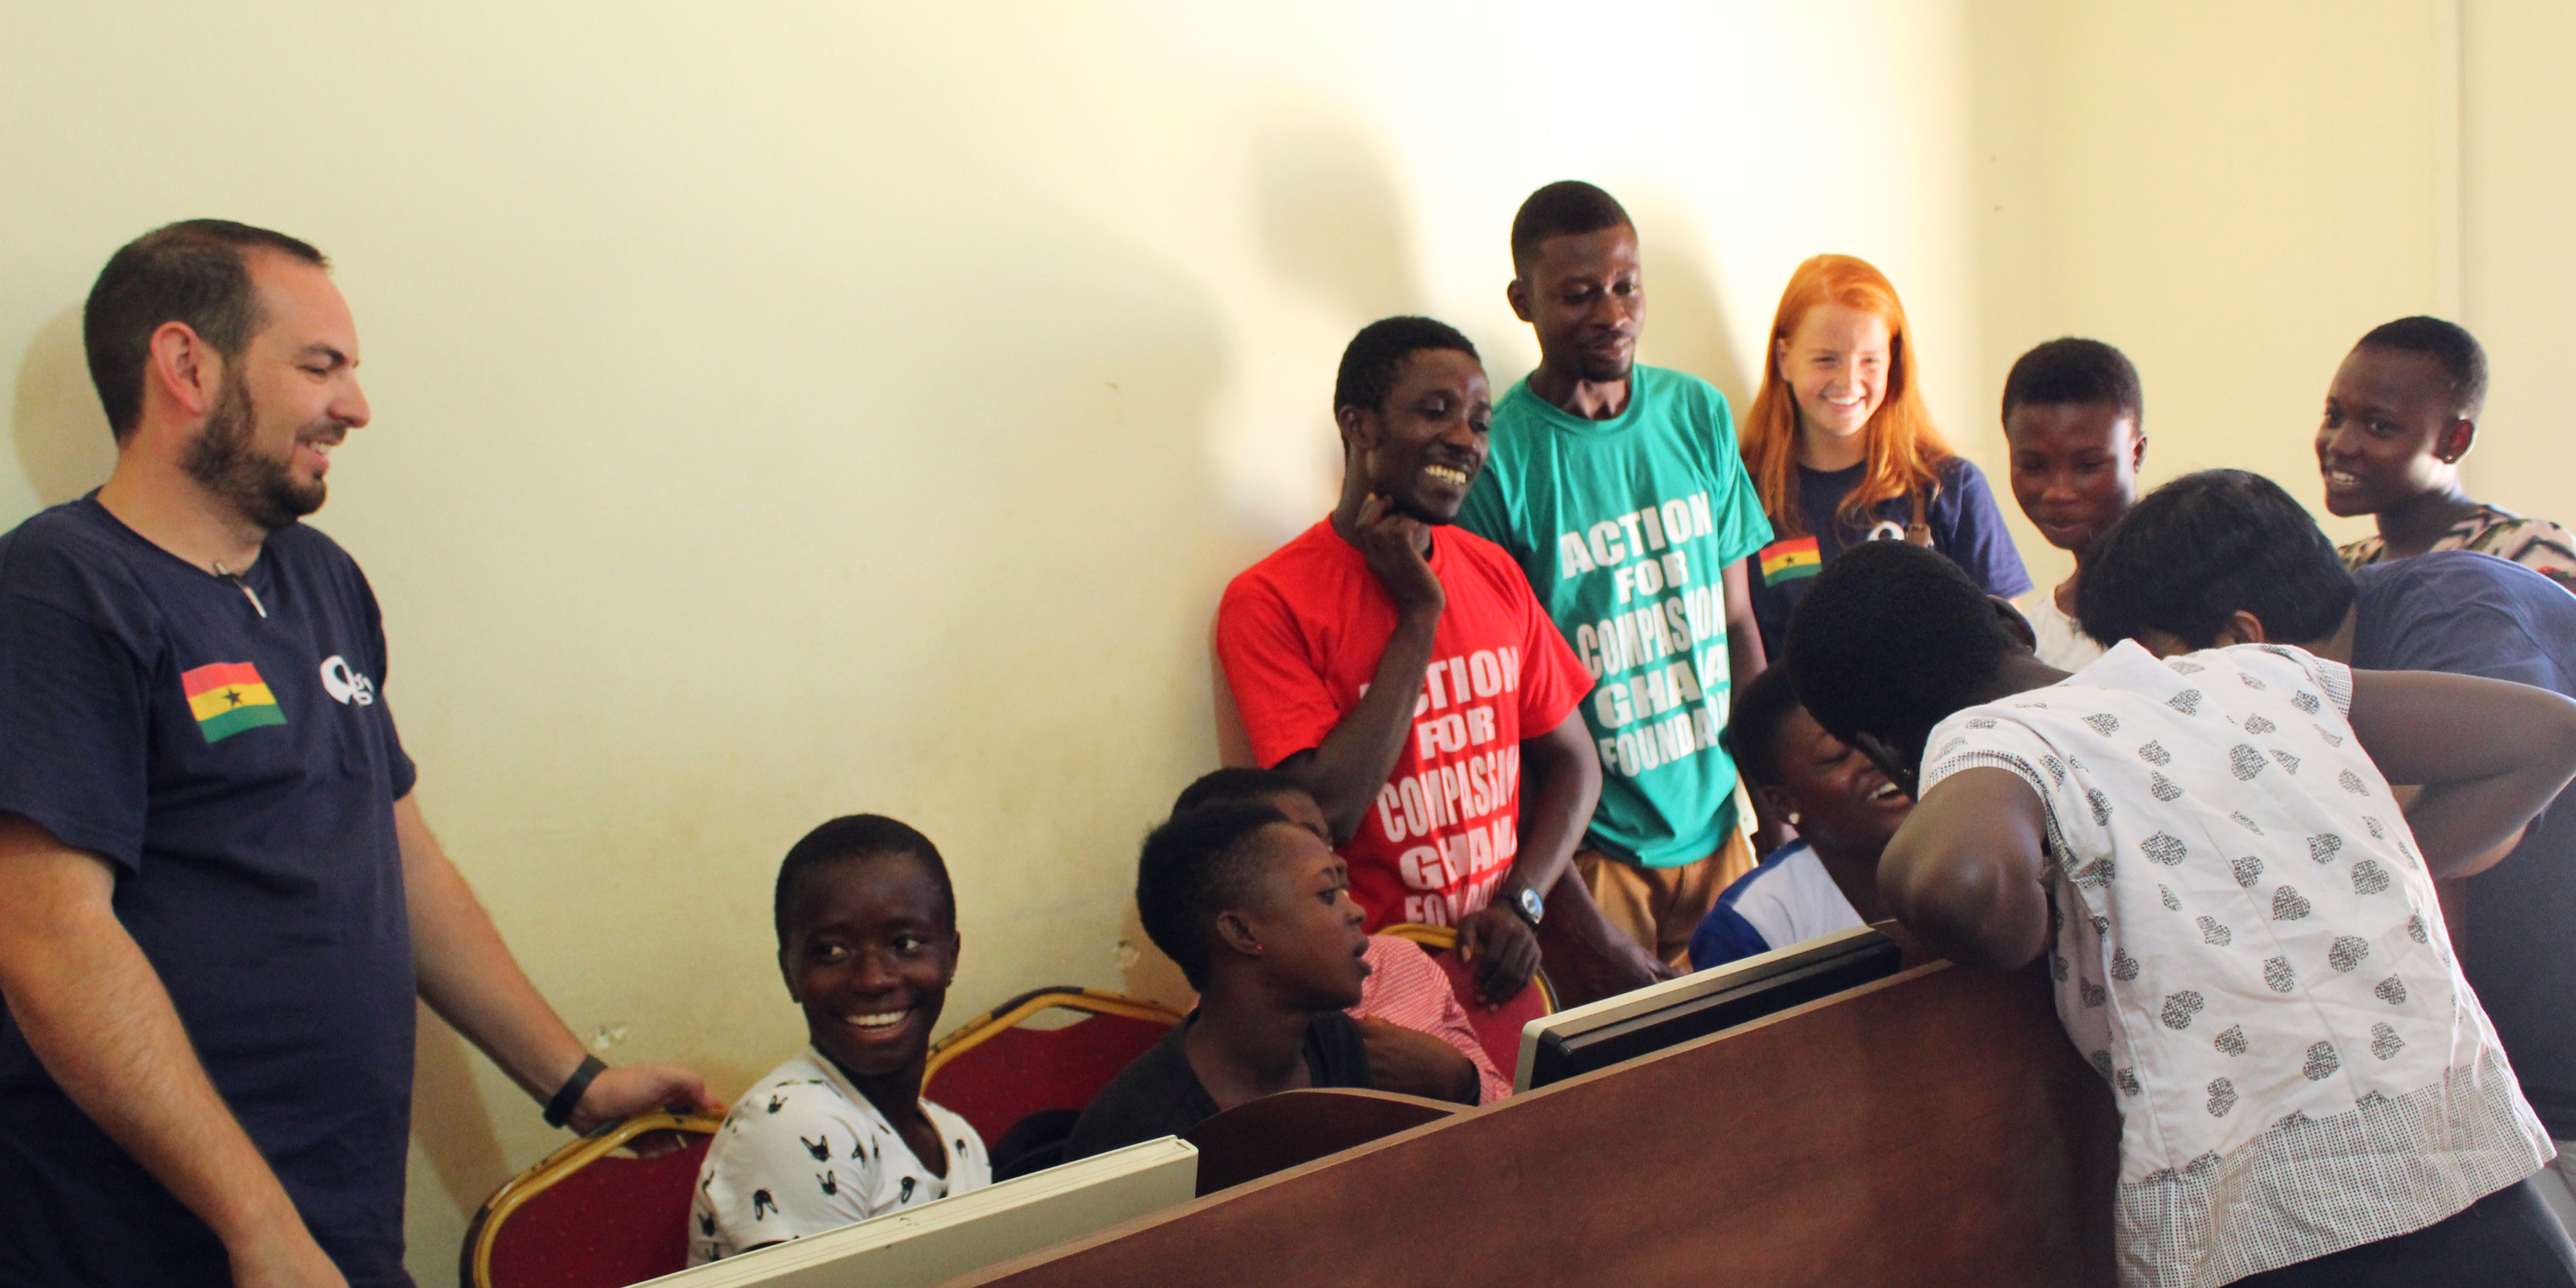 GVI participants take a career break in Ghana, and help facilitate computer skills development workshops.